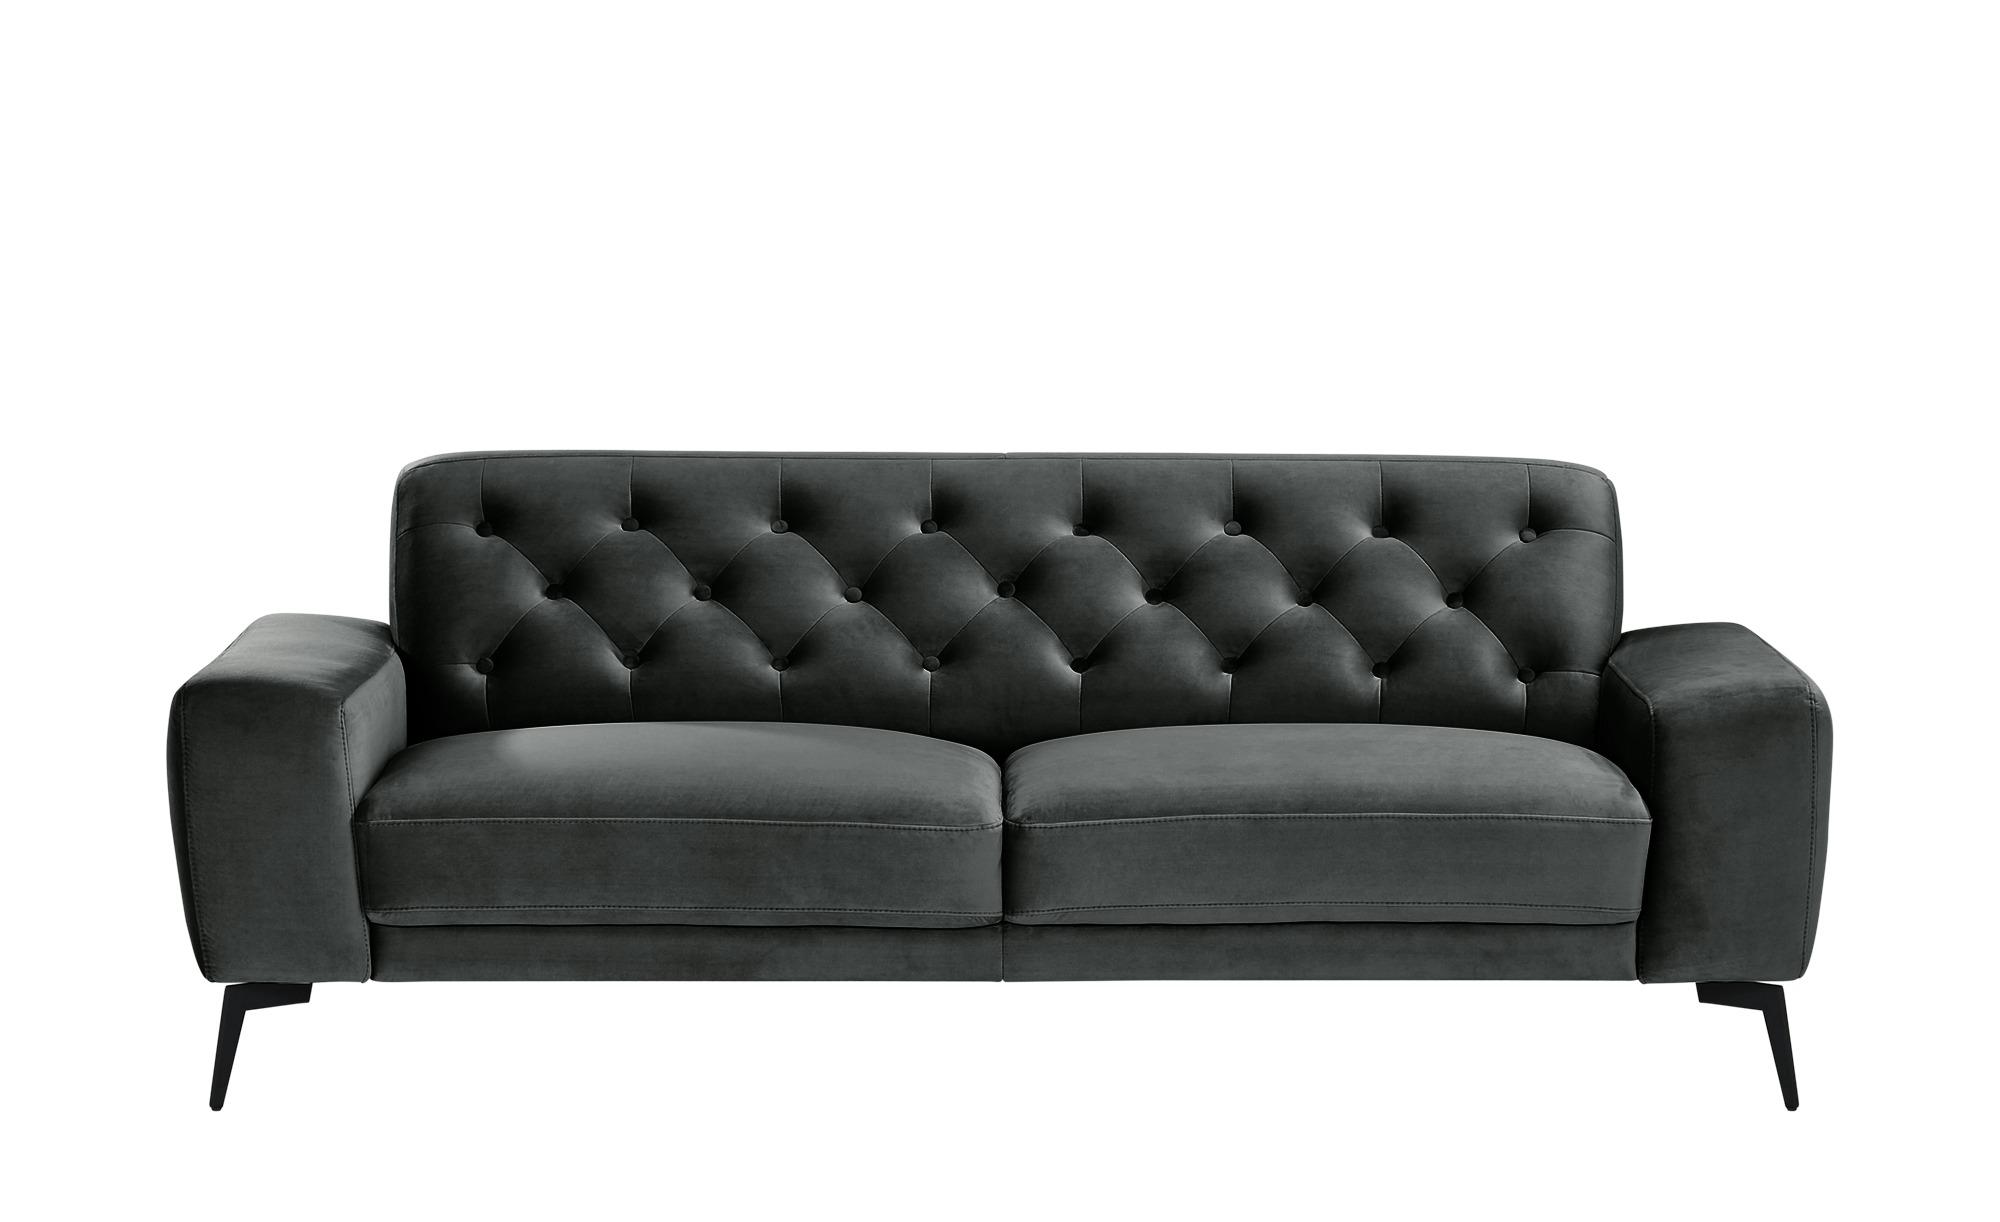 smart Sofa  Alana ¦ grau ¦ Maße (cm): B: 216 H: 77 T: 95 Polstermöbel > Sofas > 3-Sitzer - Höffner